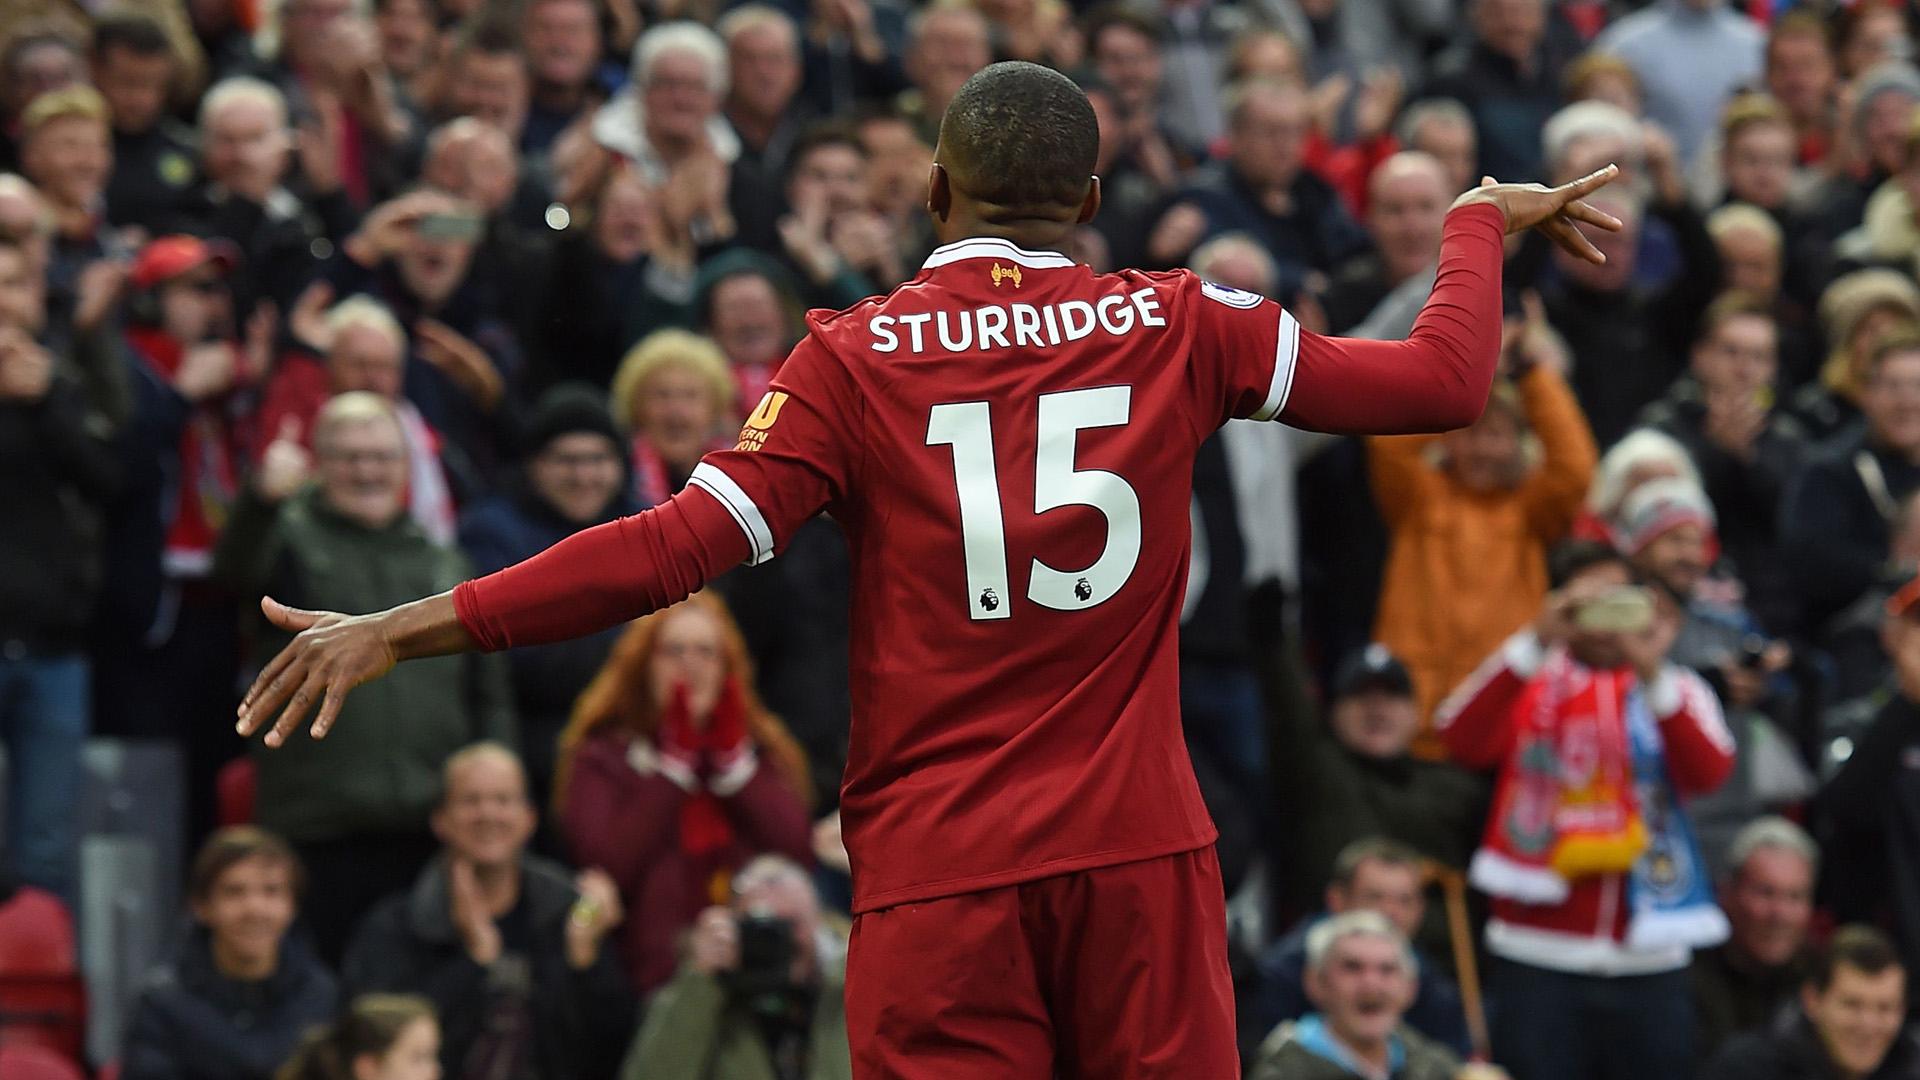 Daniel Sturridge Liverpool Huddersfield Town Premier League